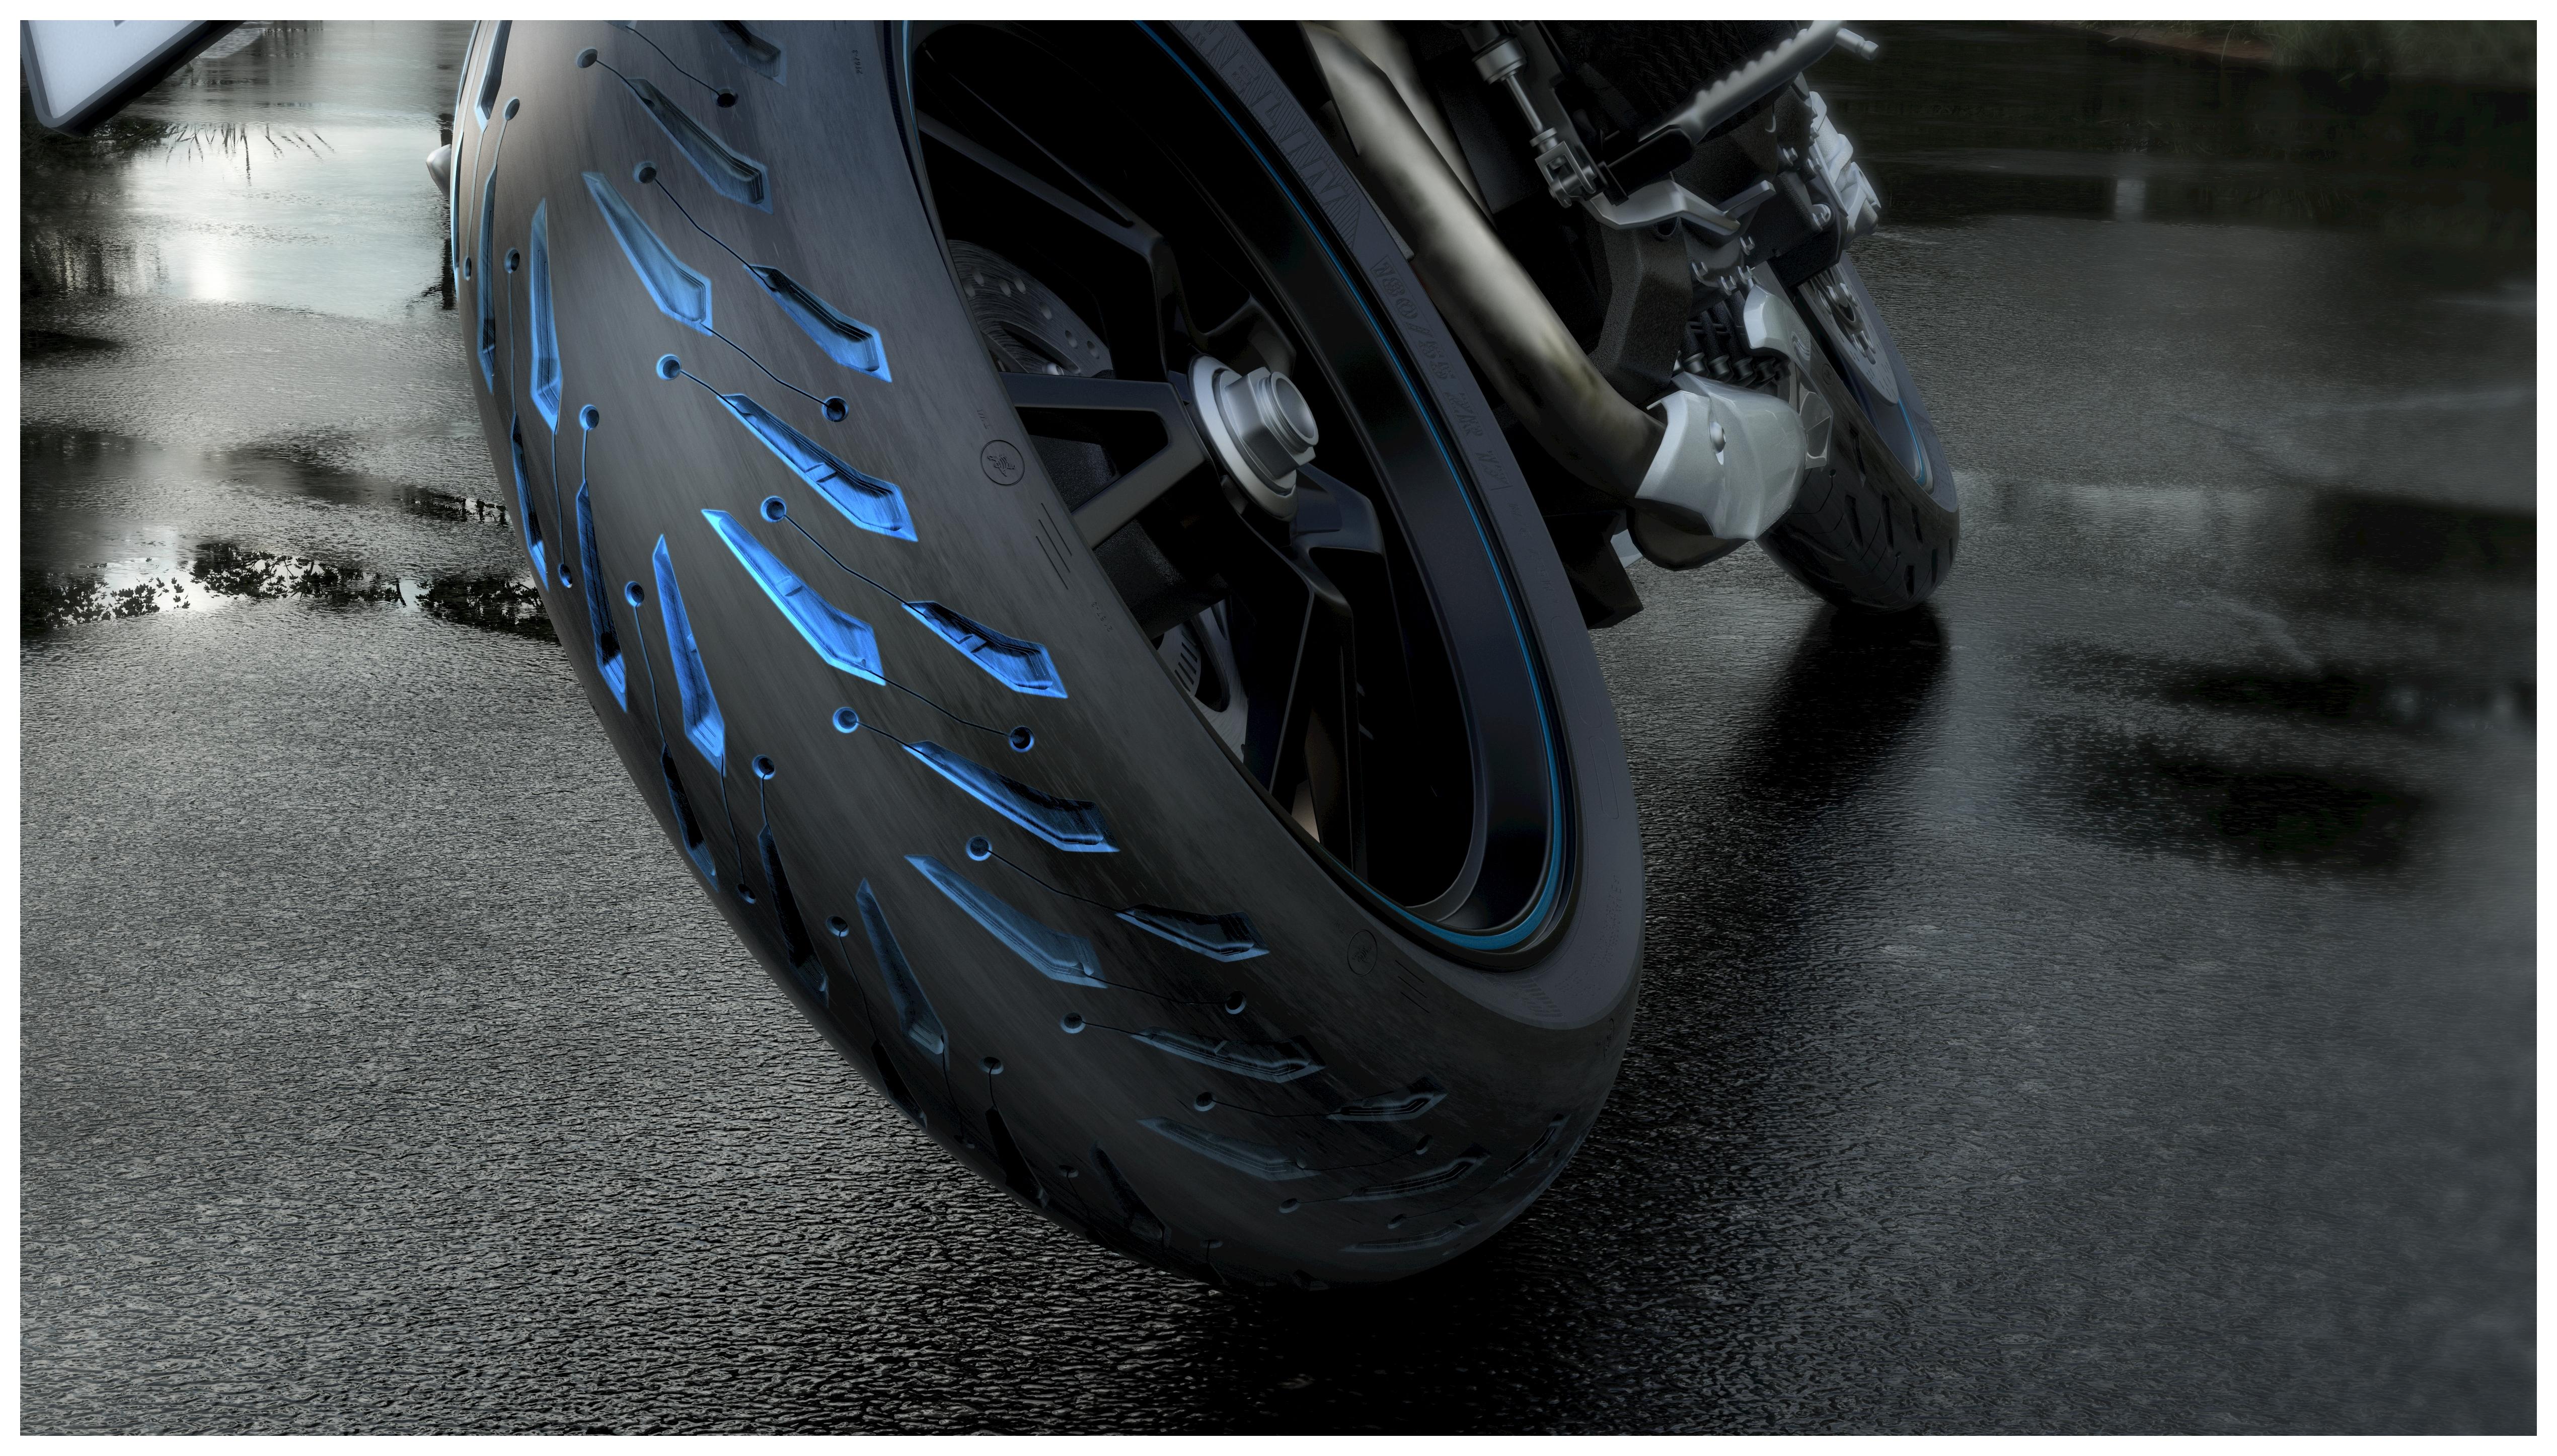 Kendte Michelin Road 5 Tires | 37% ($130.63) Off! - RevZilla PN-38